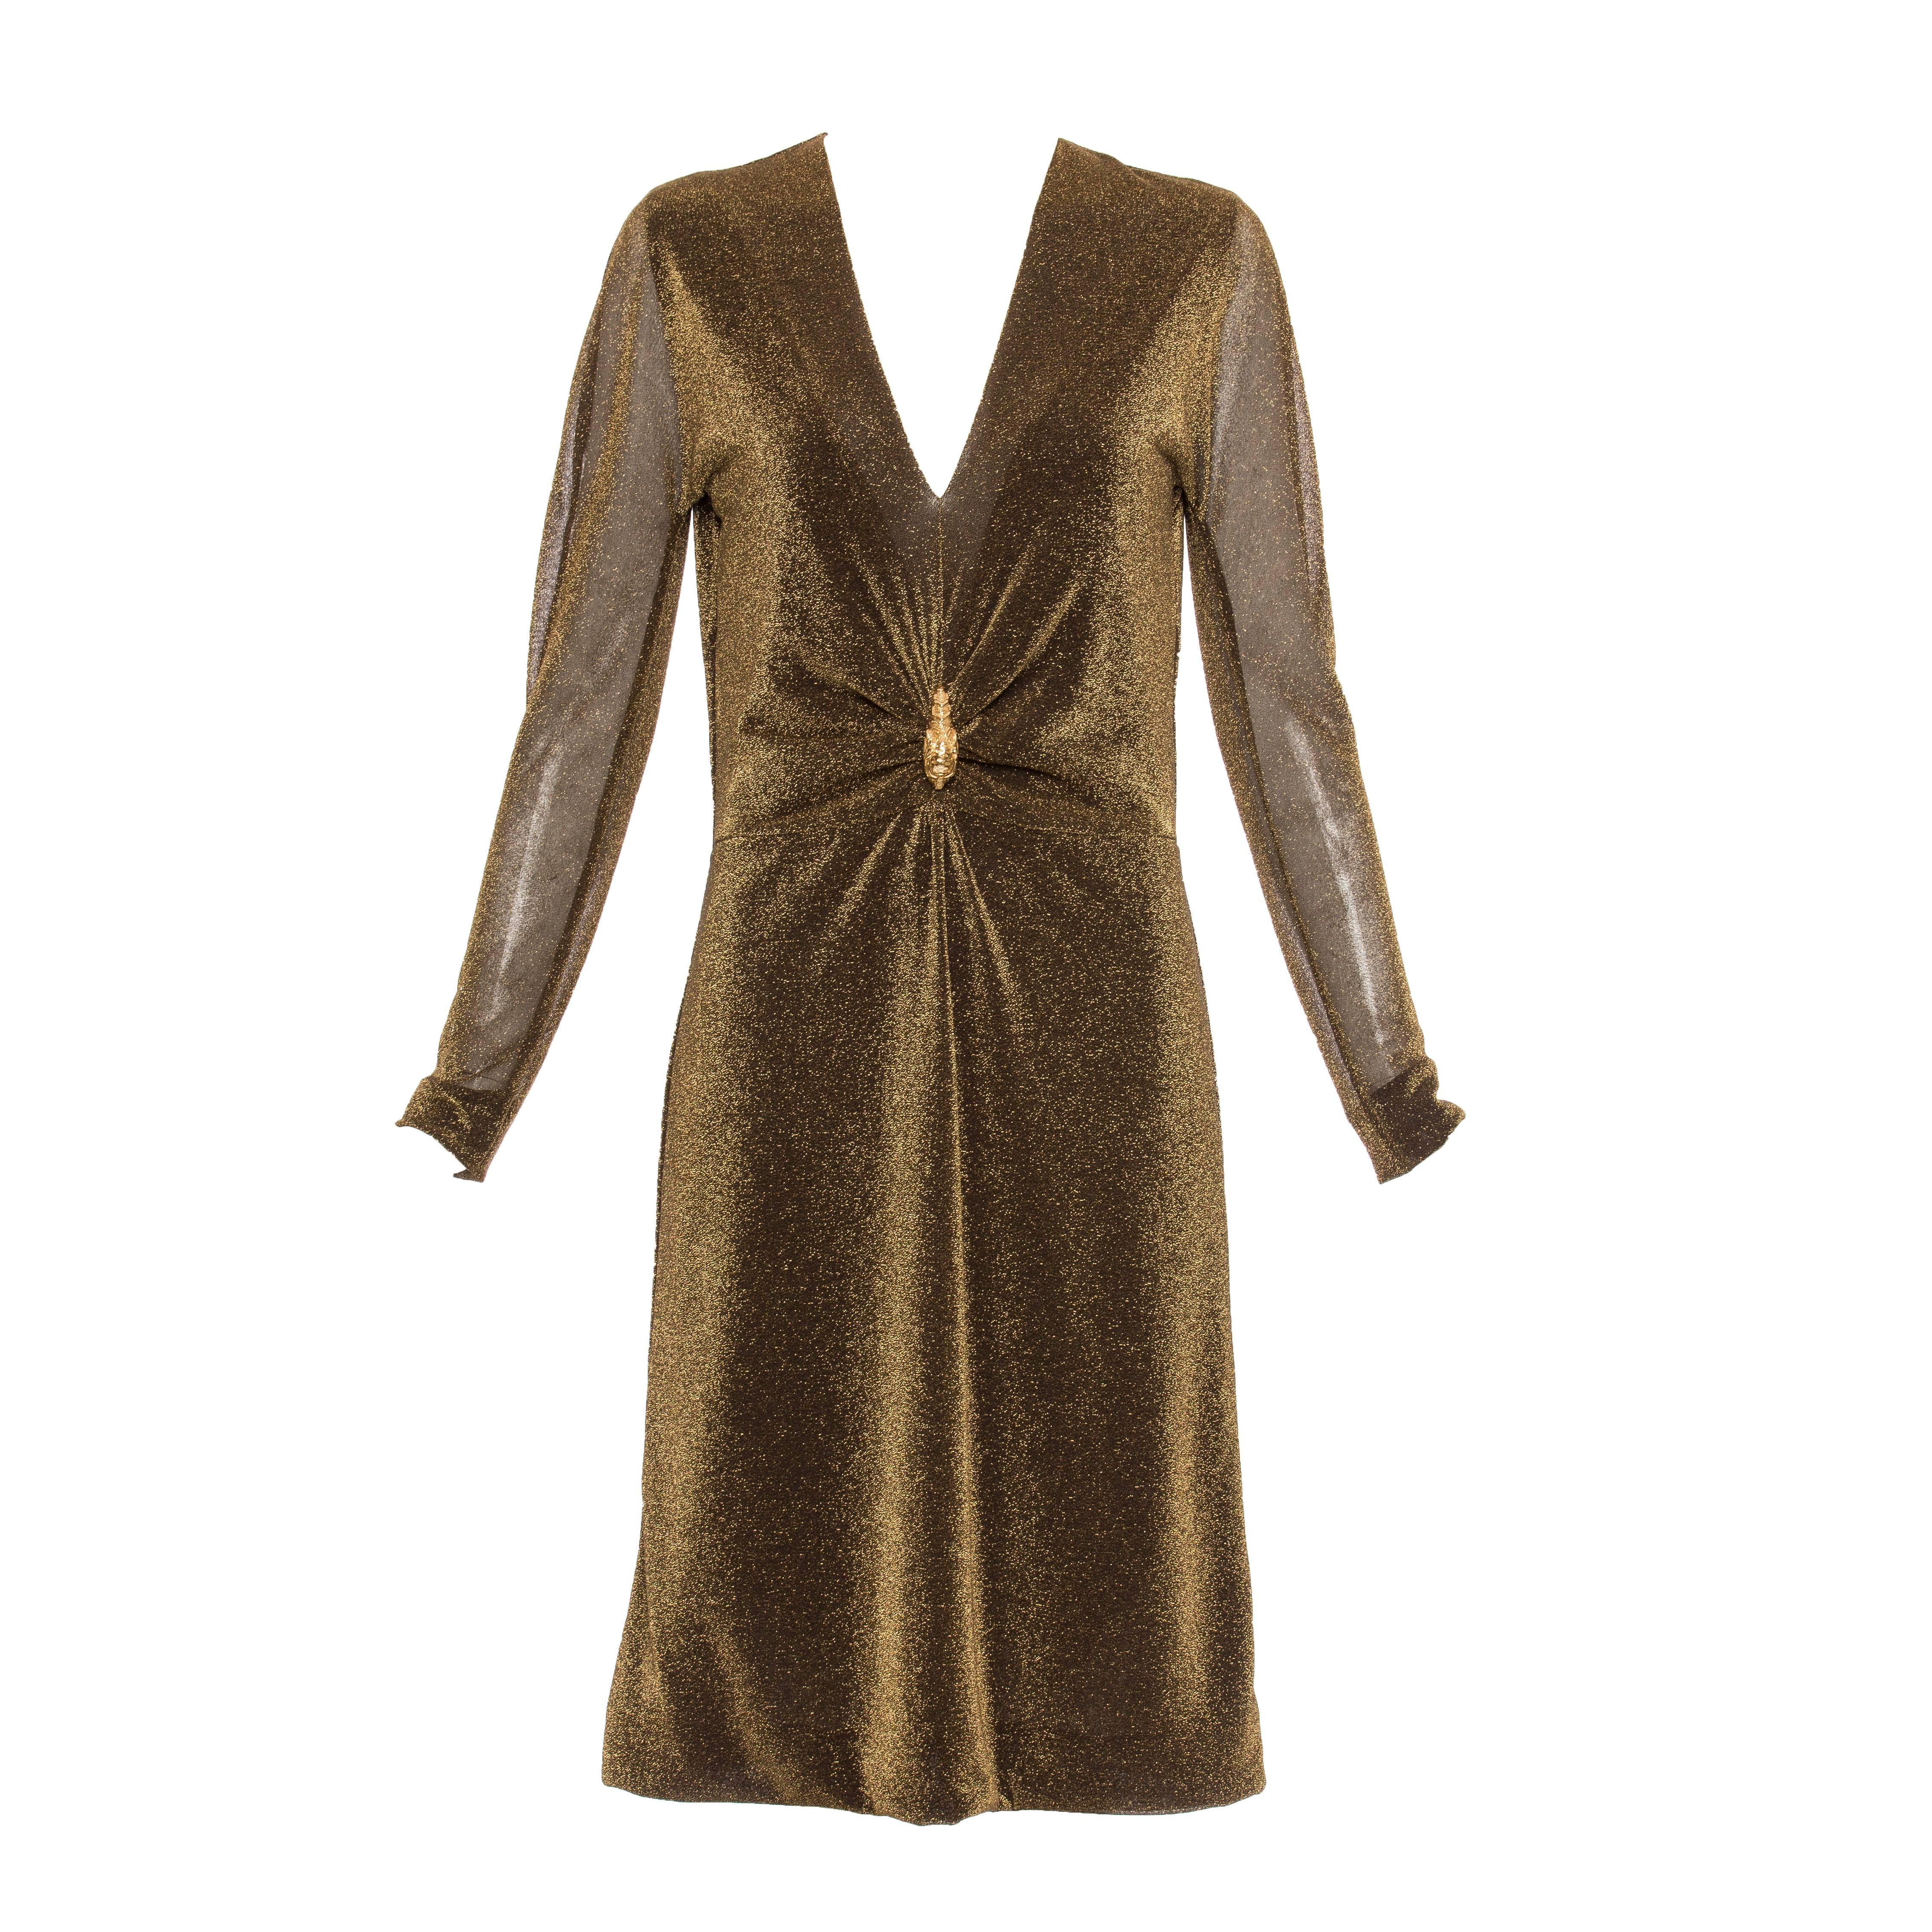 Tom Ford for Gucci Runway Bronze Metallic Dress Lion Brooch, Fall 2000